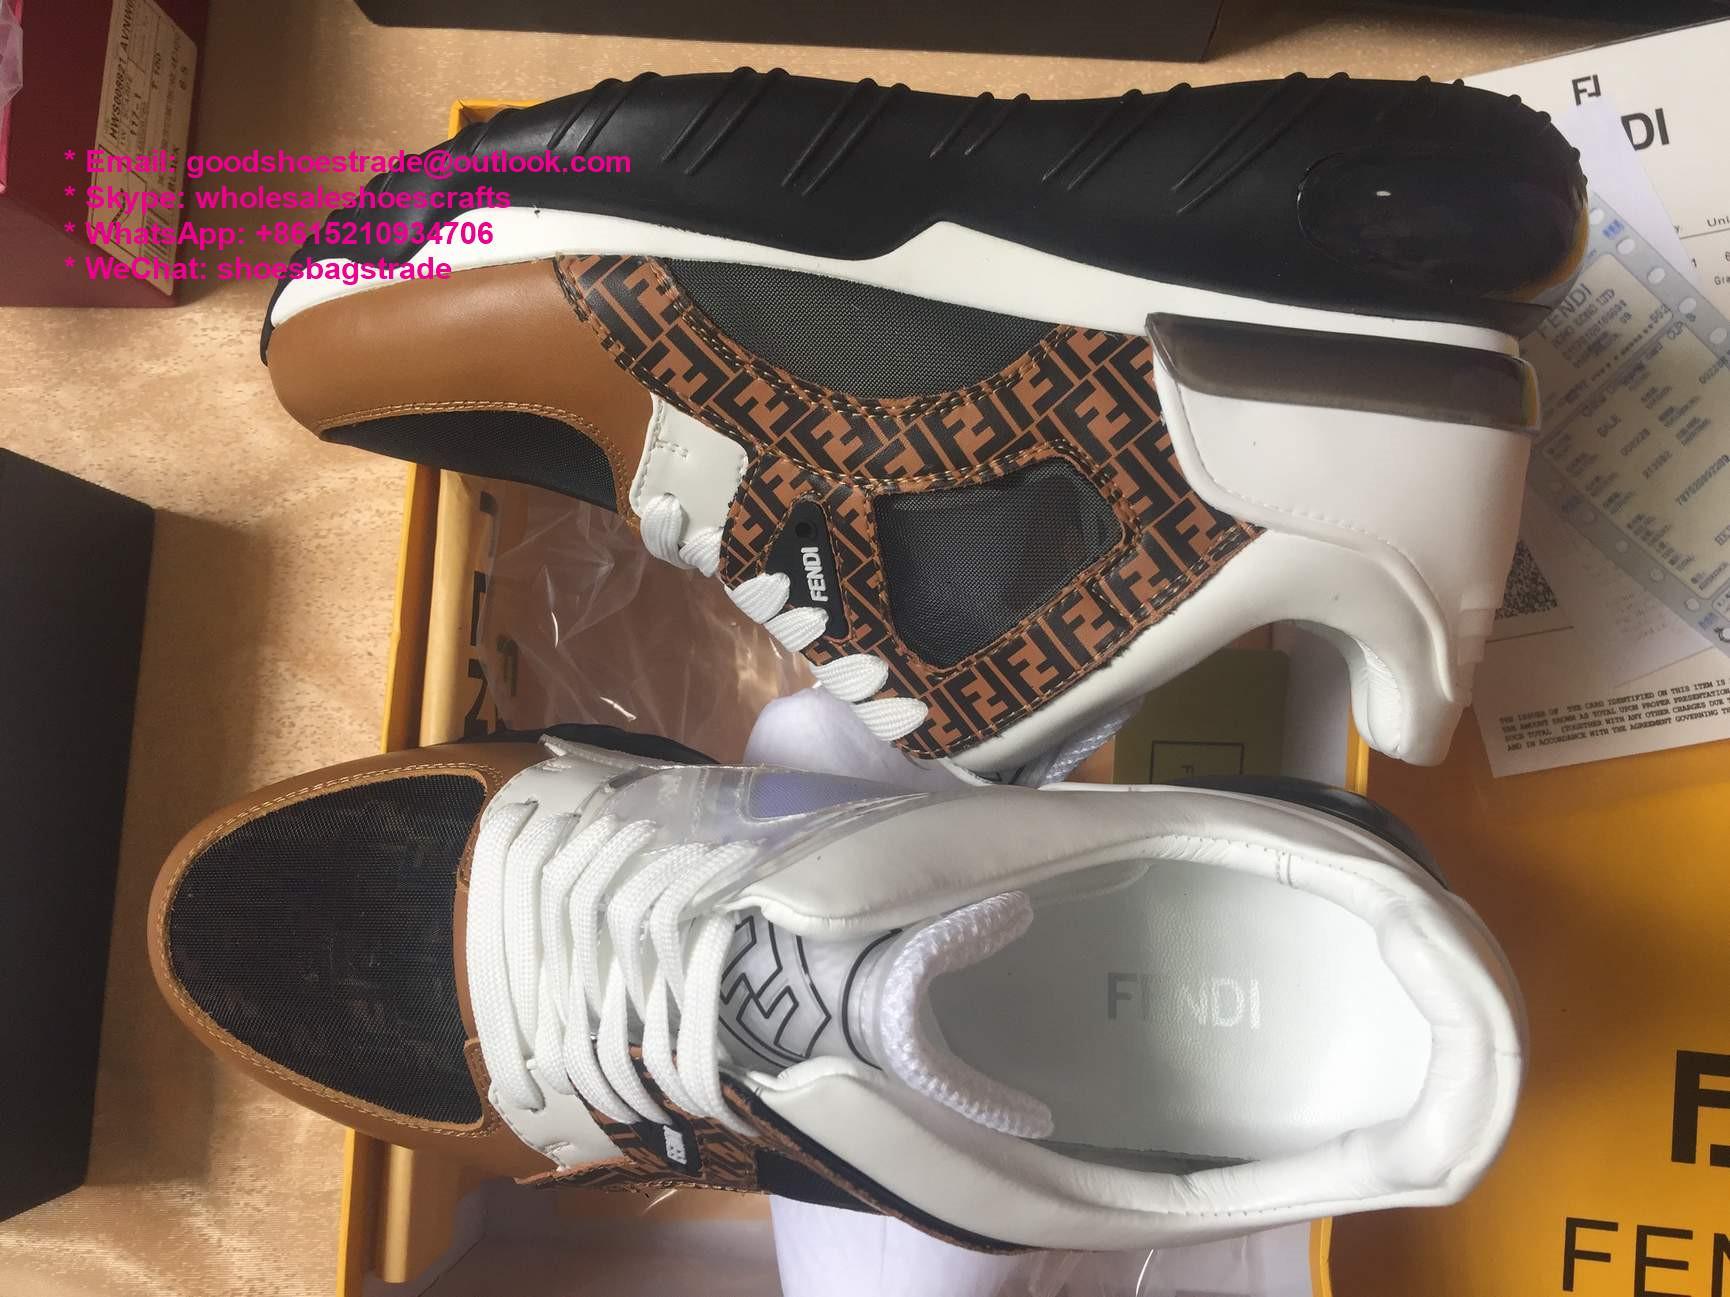 Fendi Mania Rocko leather sock Fendi sneaker Fendi boots Fendi Shoes Fendi Slipp